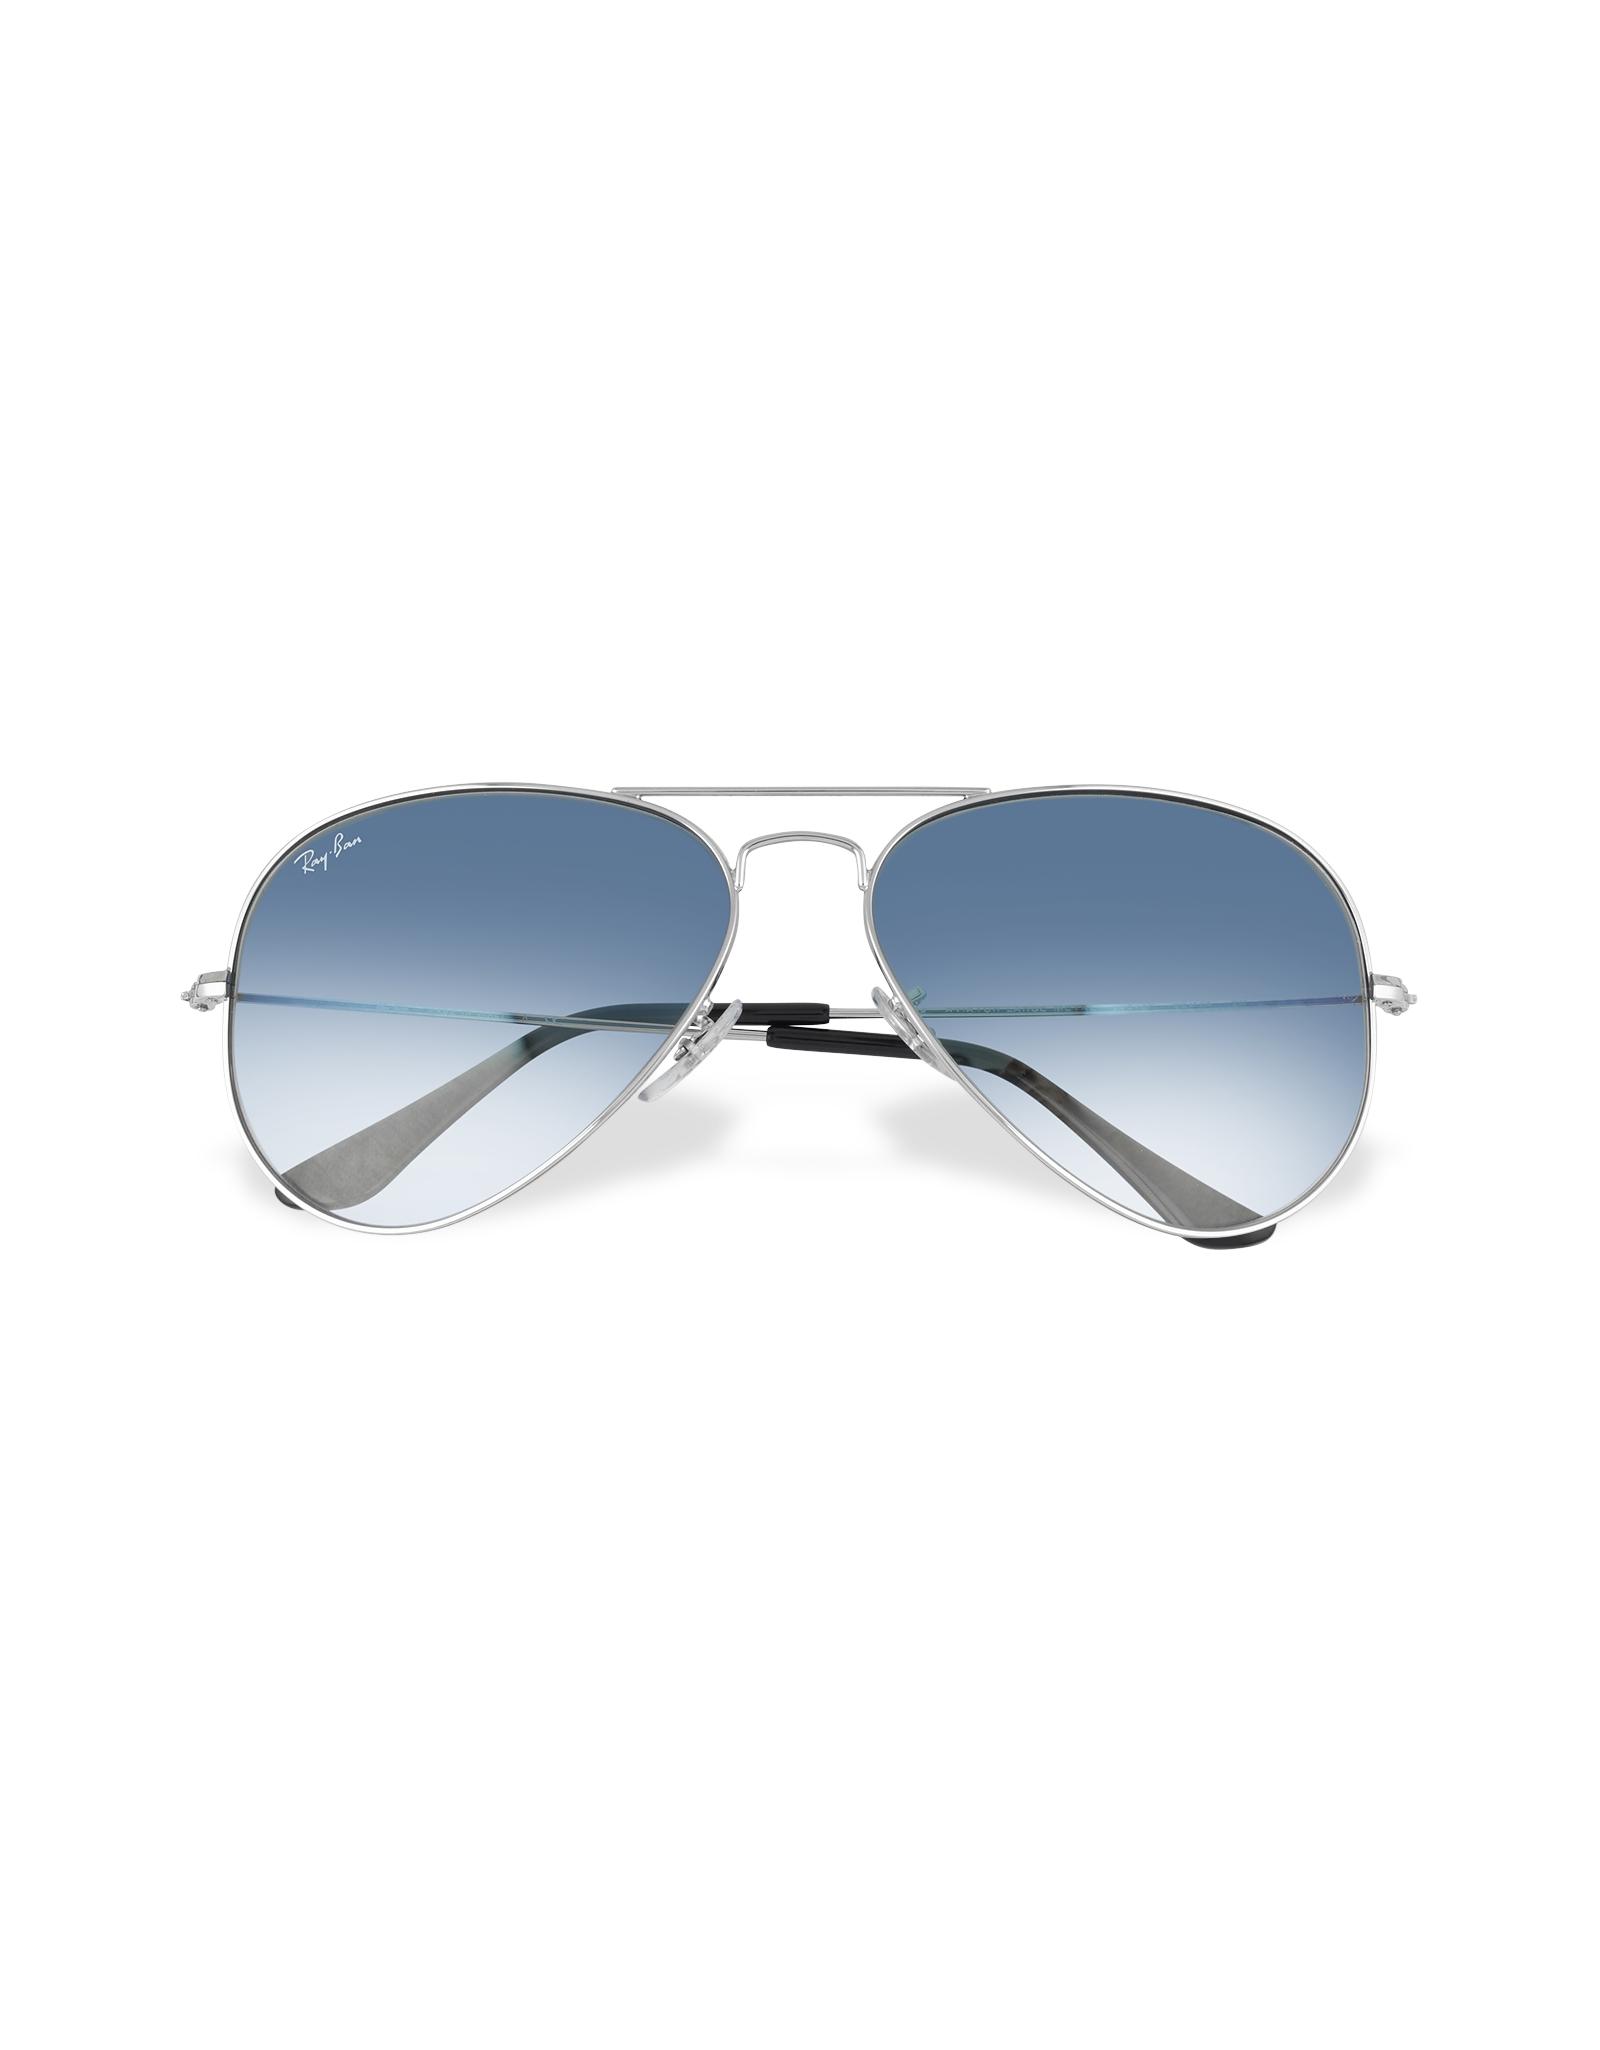 Ray ban aviator silvertone metal sunglasses in metallic - Occhiali ray ban aviator specchio ...